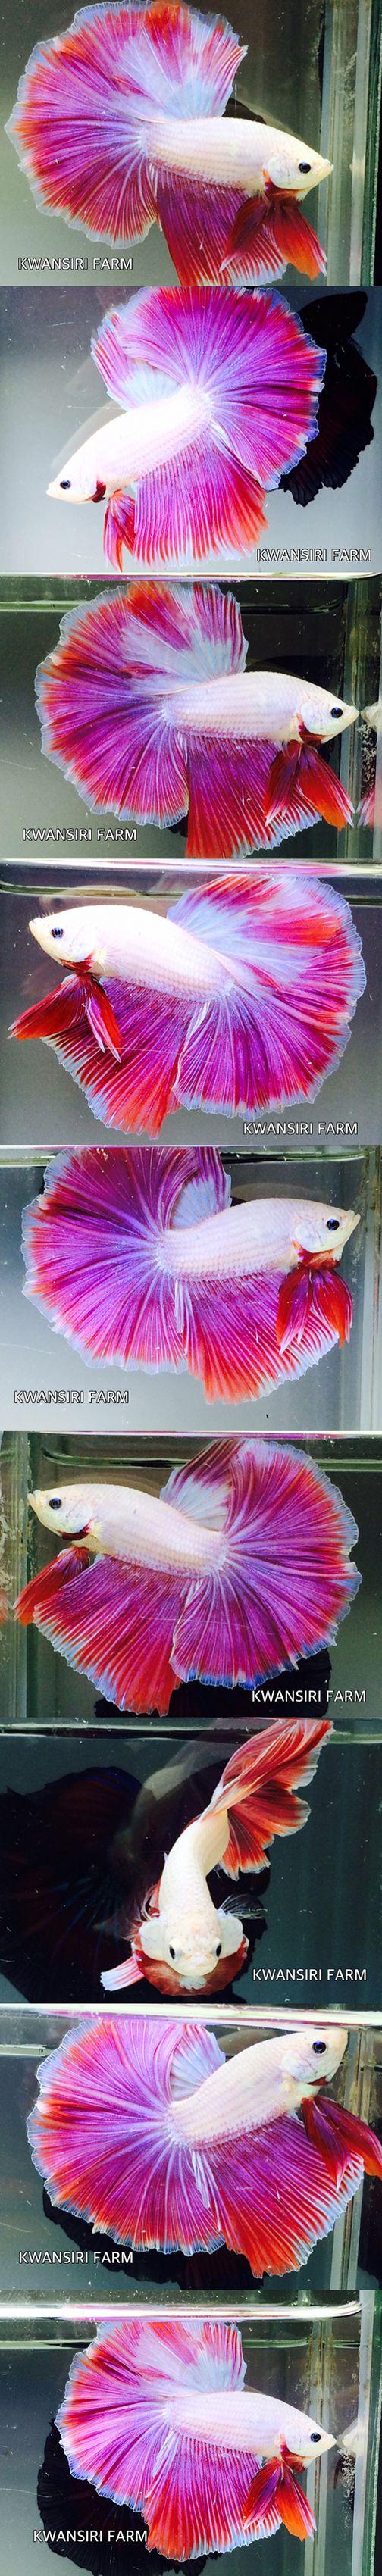 fwbettashm1440524271 - .....Pink Dragon.....male